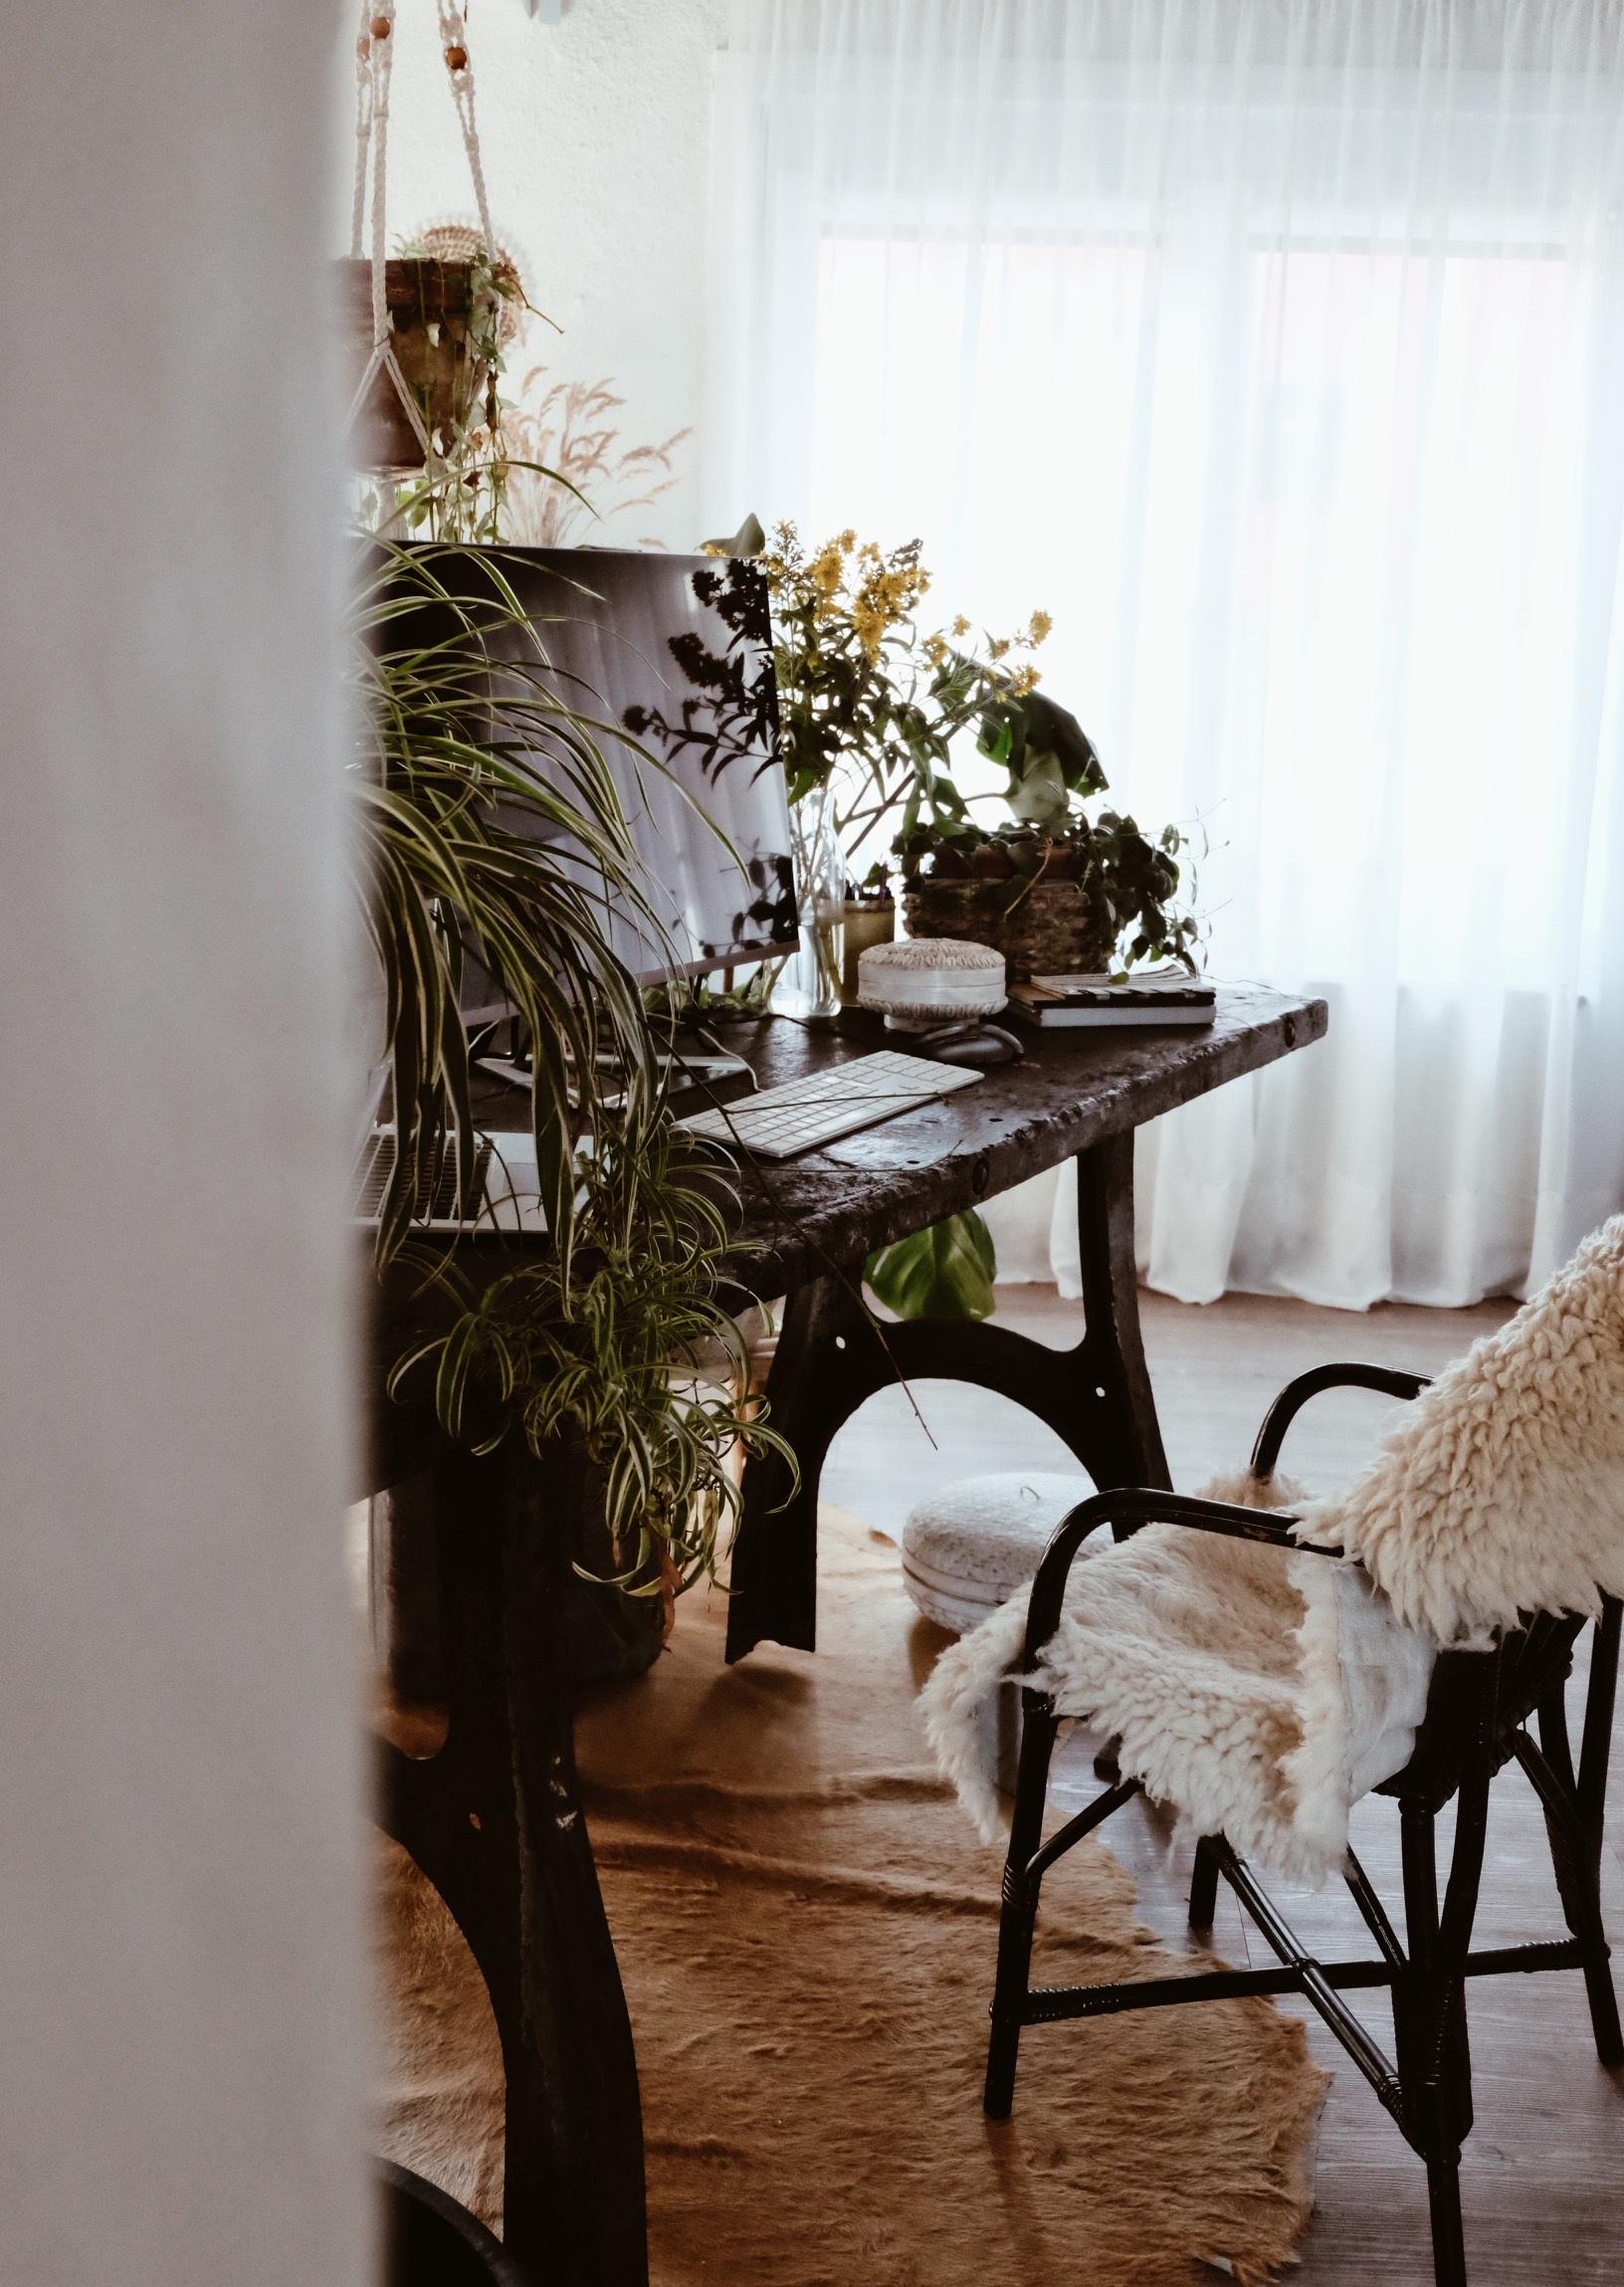 carnet+sauvage+-+blog+decoration+-+home+tour+-+bohemian+home